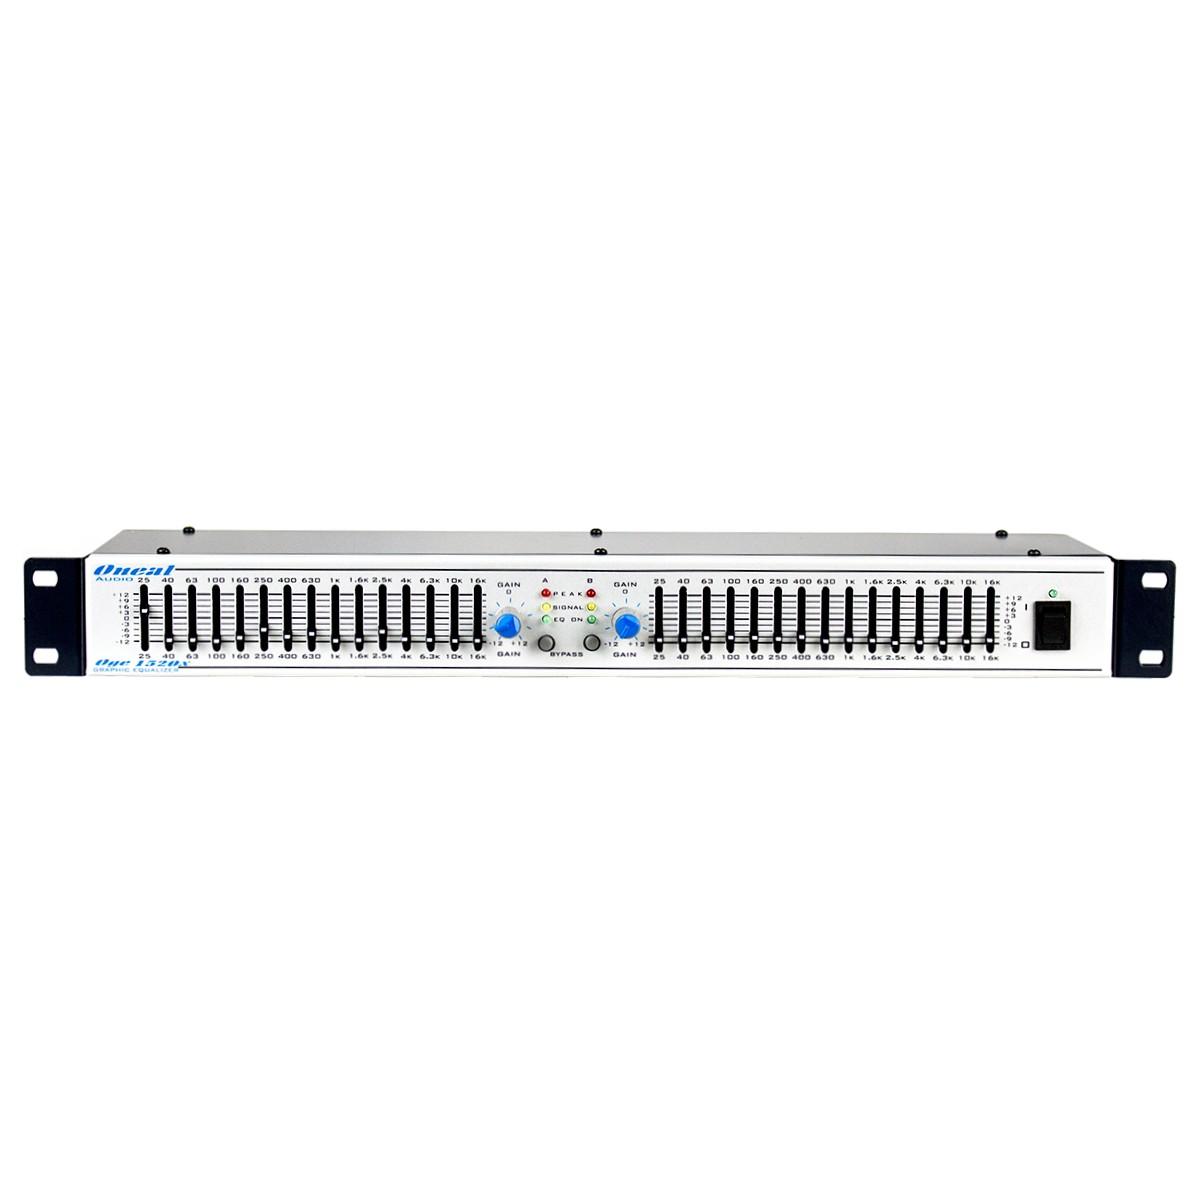 OGE1520X - Equalizador Gráfico 15 Bandas OGE 1520X - Oneal